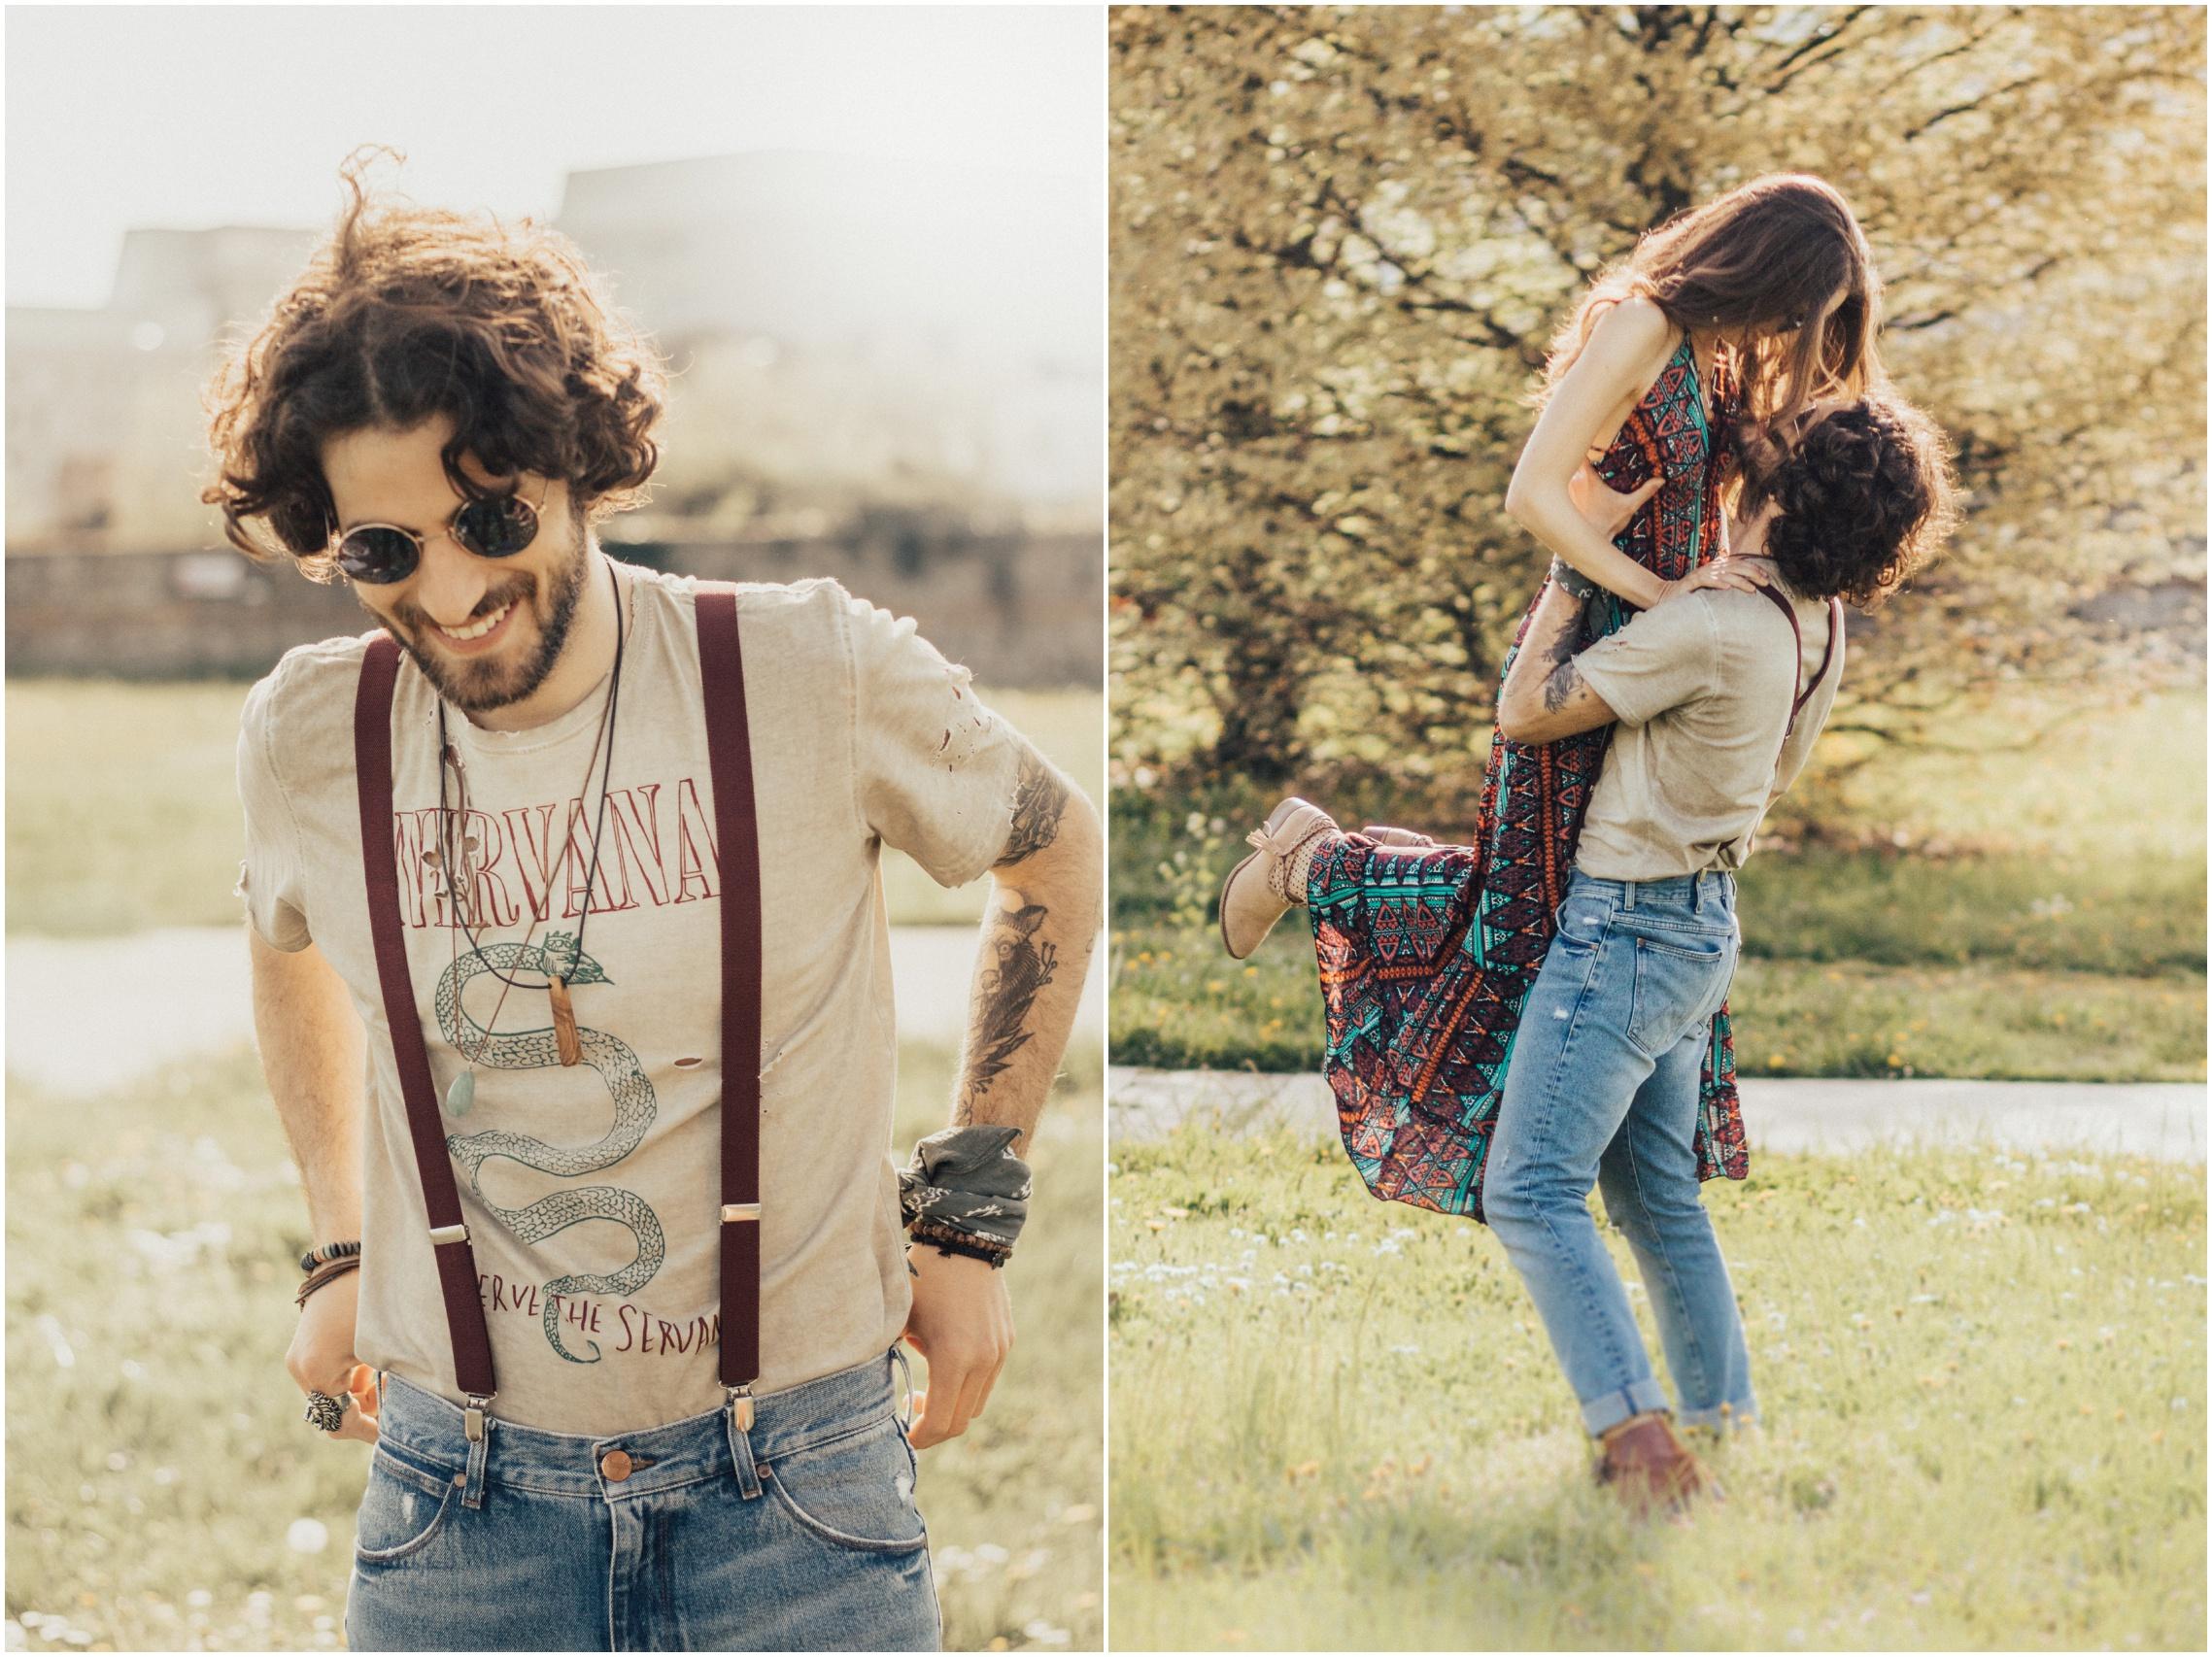 fotografo-matrimonio-vicenza-stefano-degirmenci